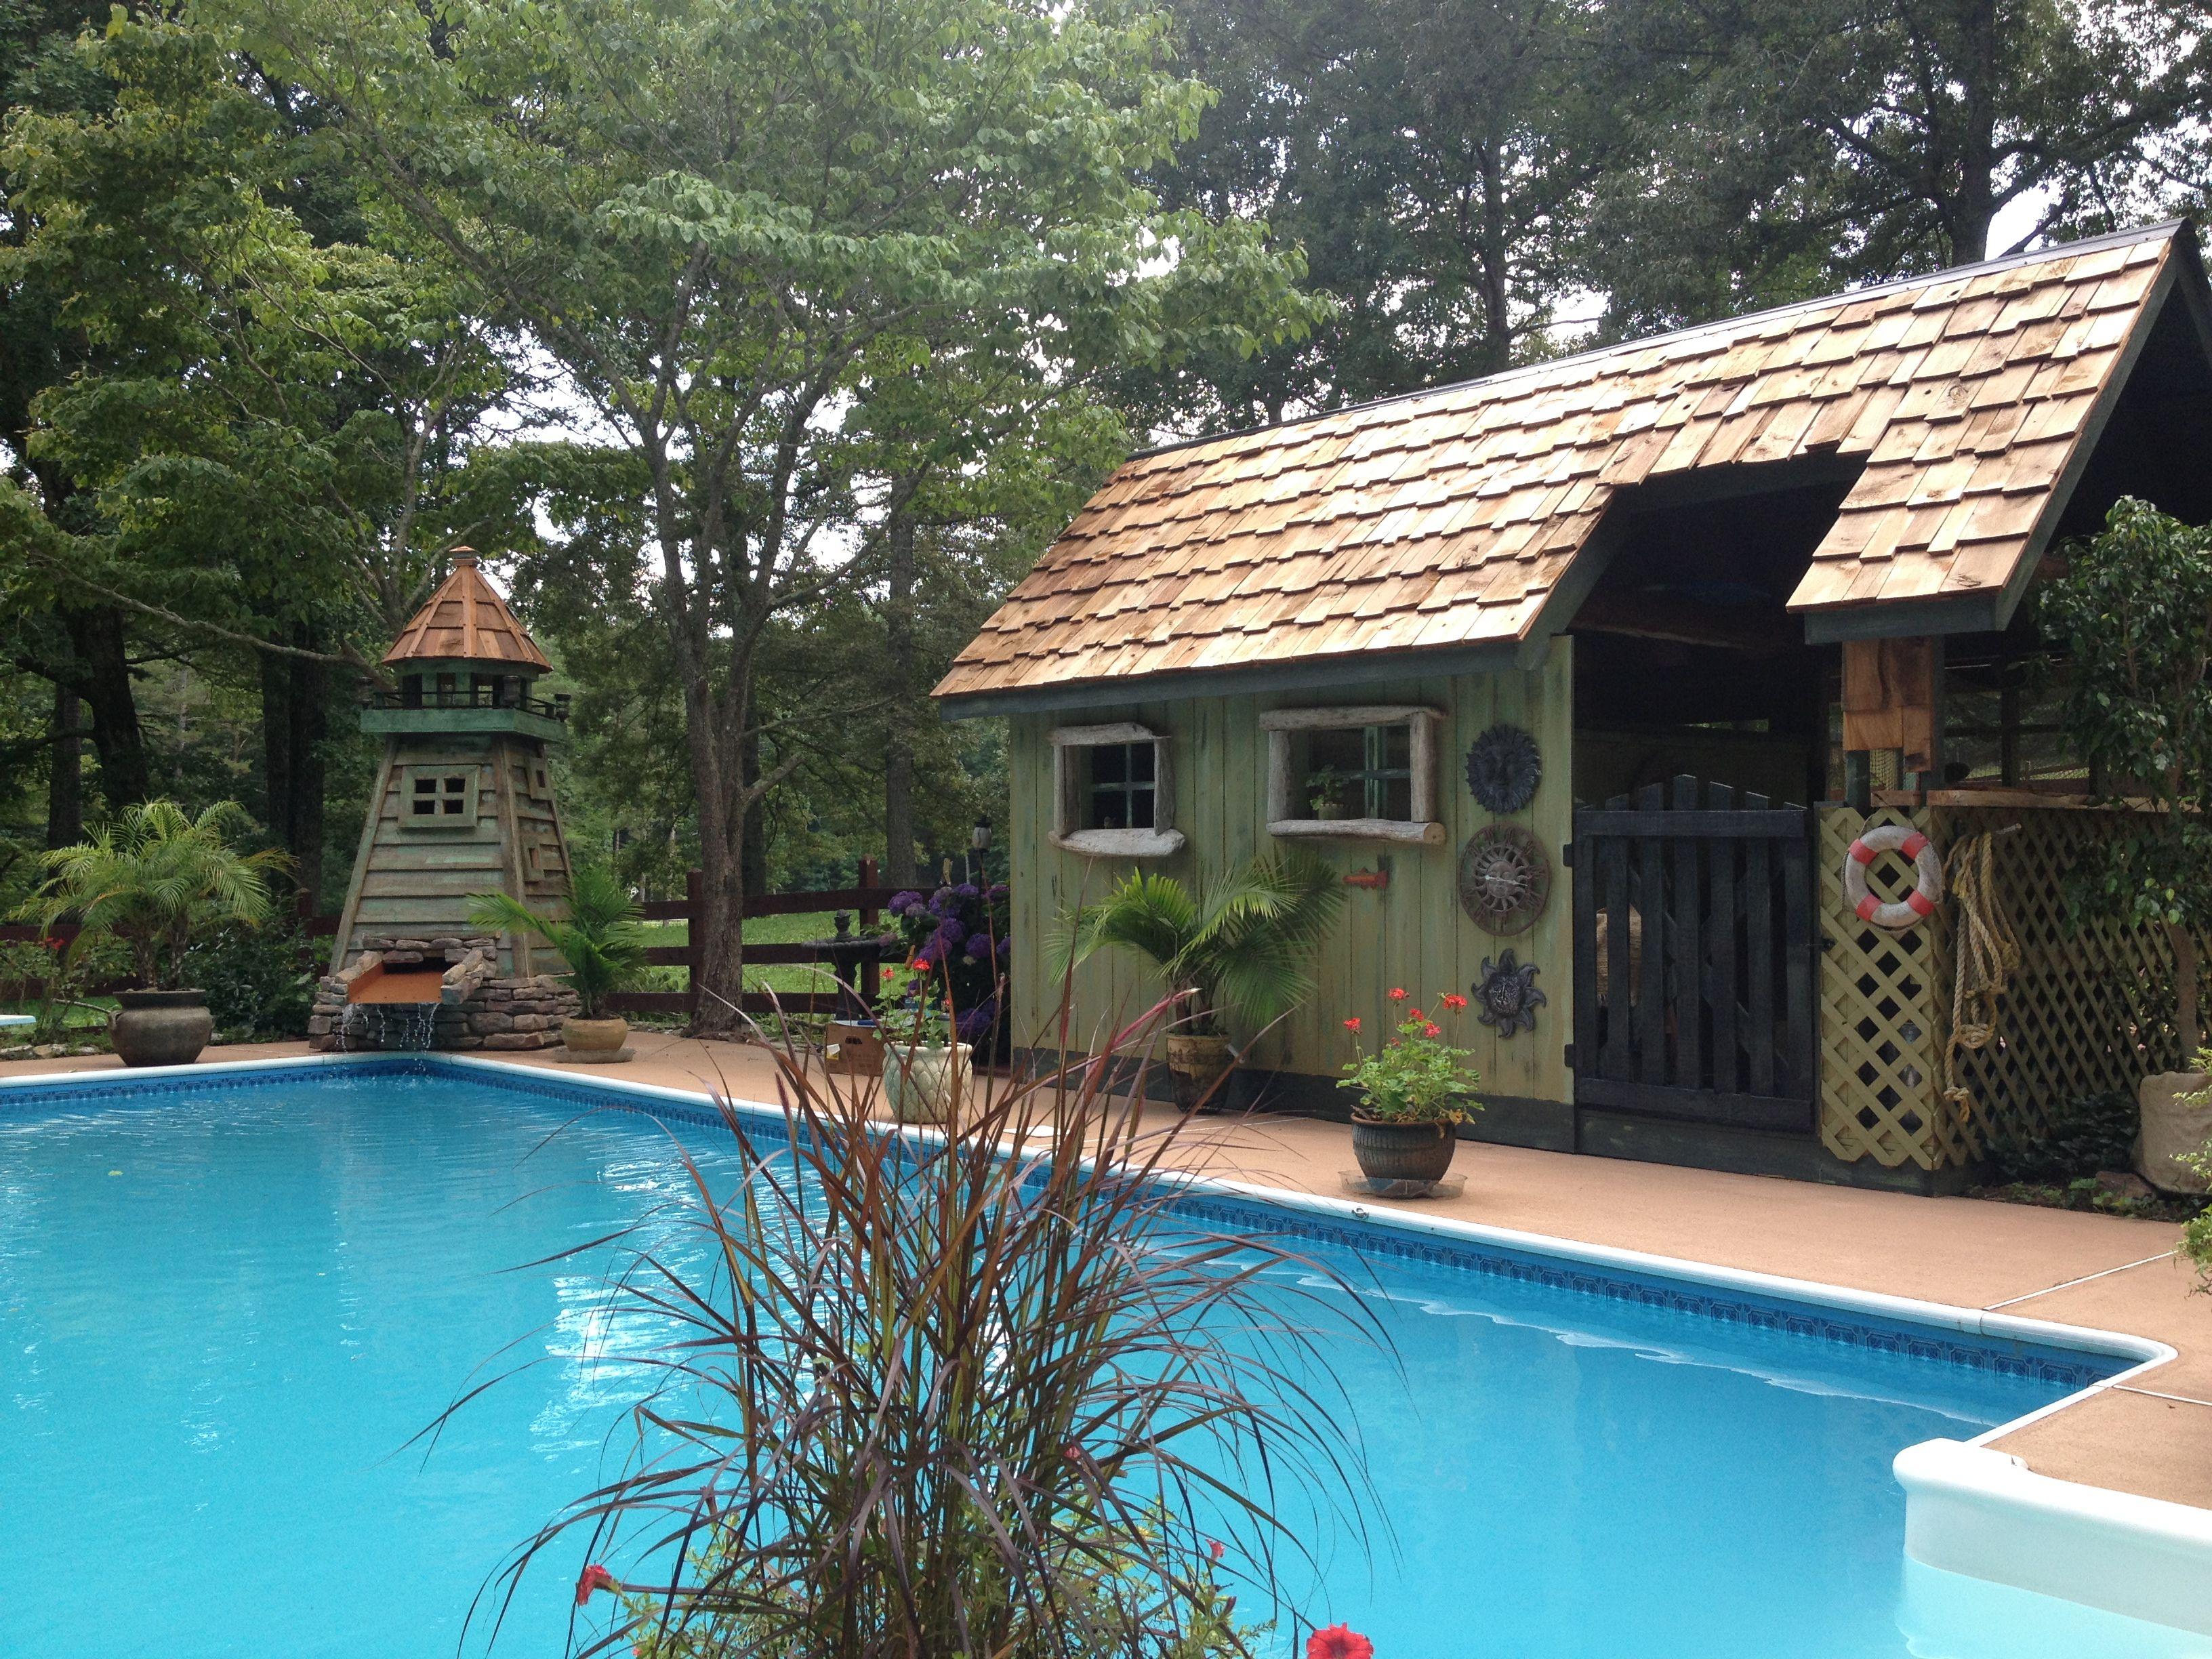 Rustic Pool House Ideas: Beautiful Lighthouse & Poolhouse! DIY Wood. Handmade